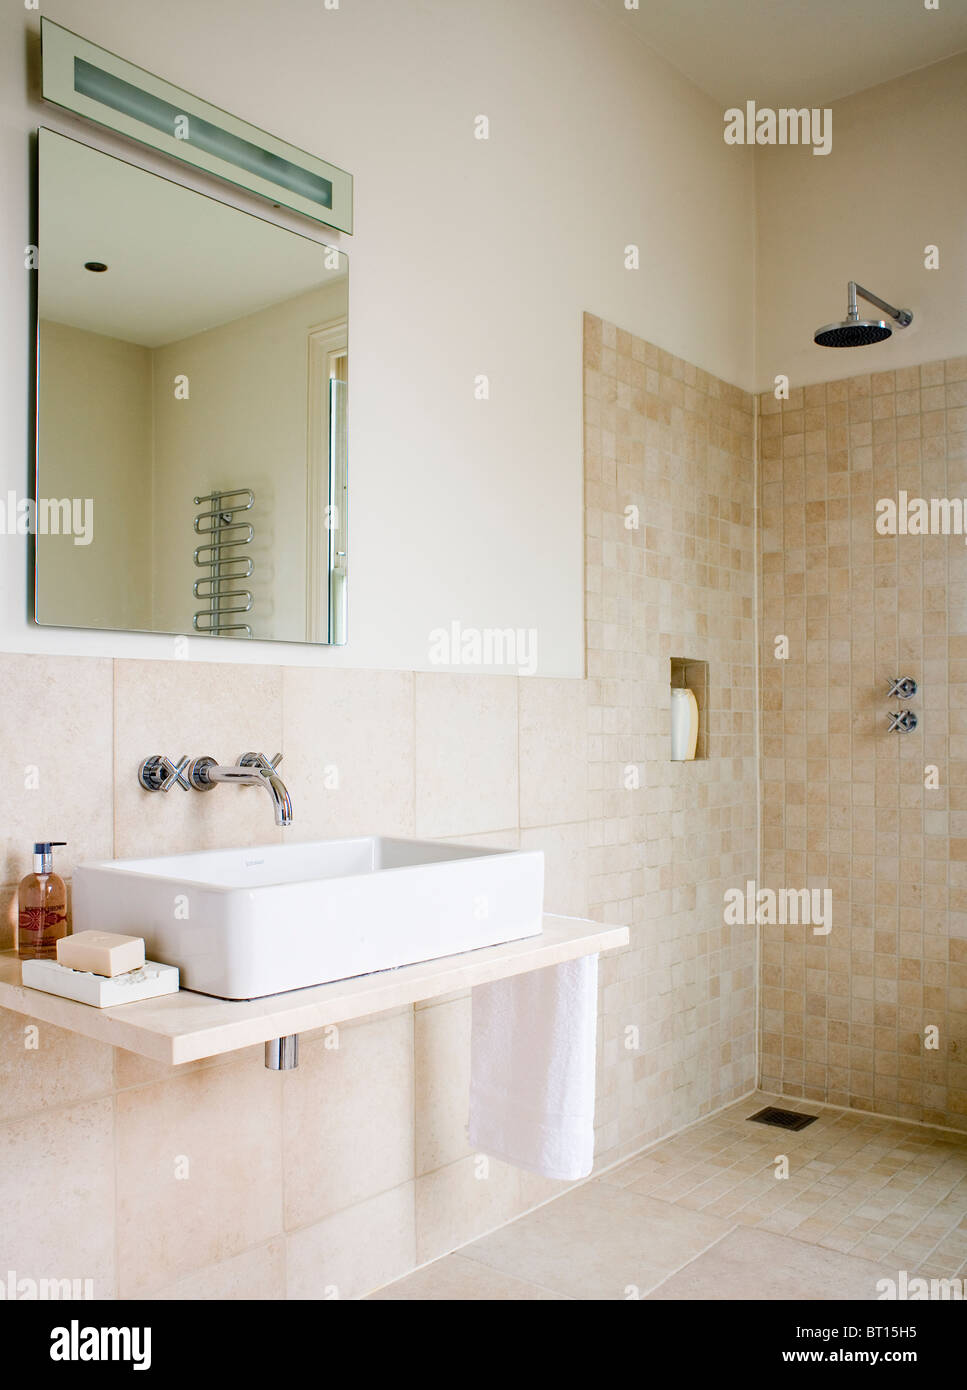 Mirror above rectangular white basin on vanity shelf in modern beige tiled  wet room with walk in shower. Mirror above rectangular white basin on vanity shelf in modern